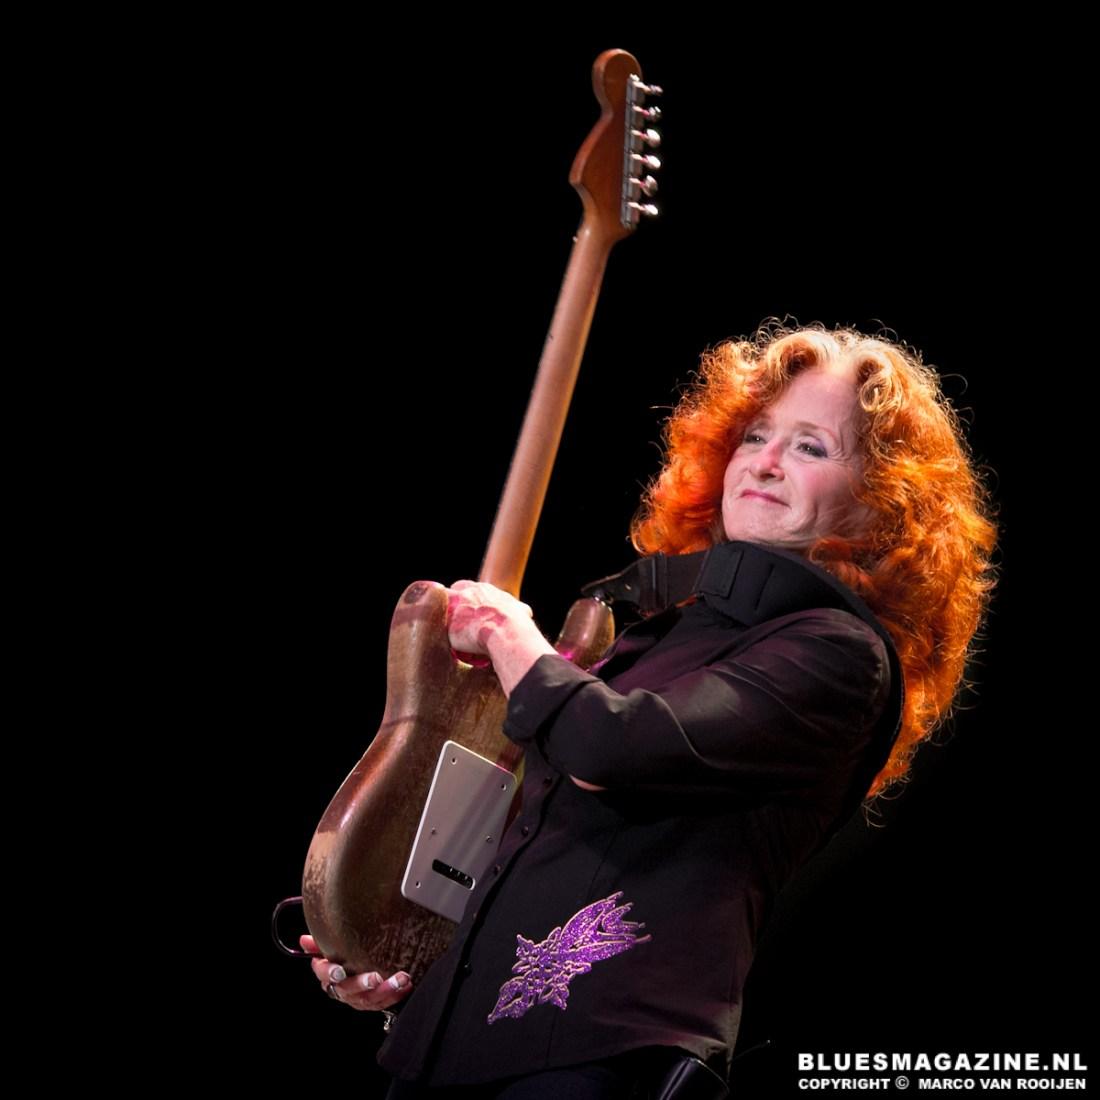 Bonnie Raitt @ North Sea Jazz Festival